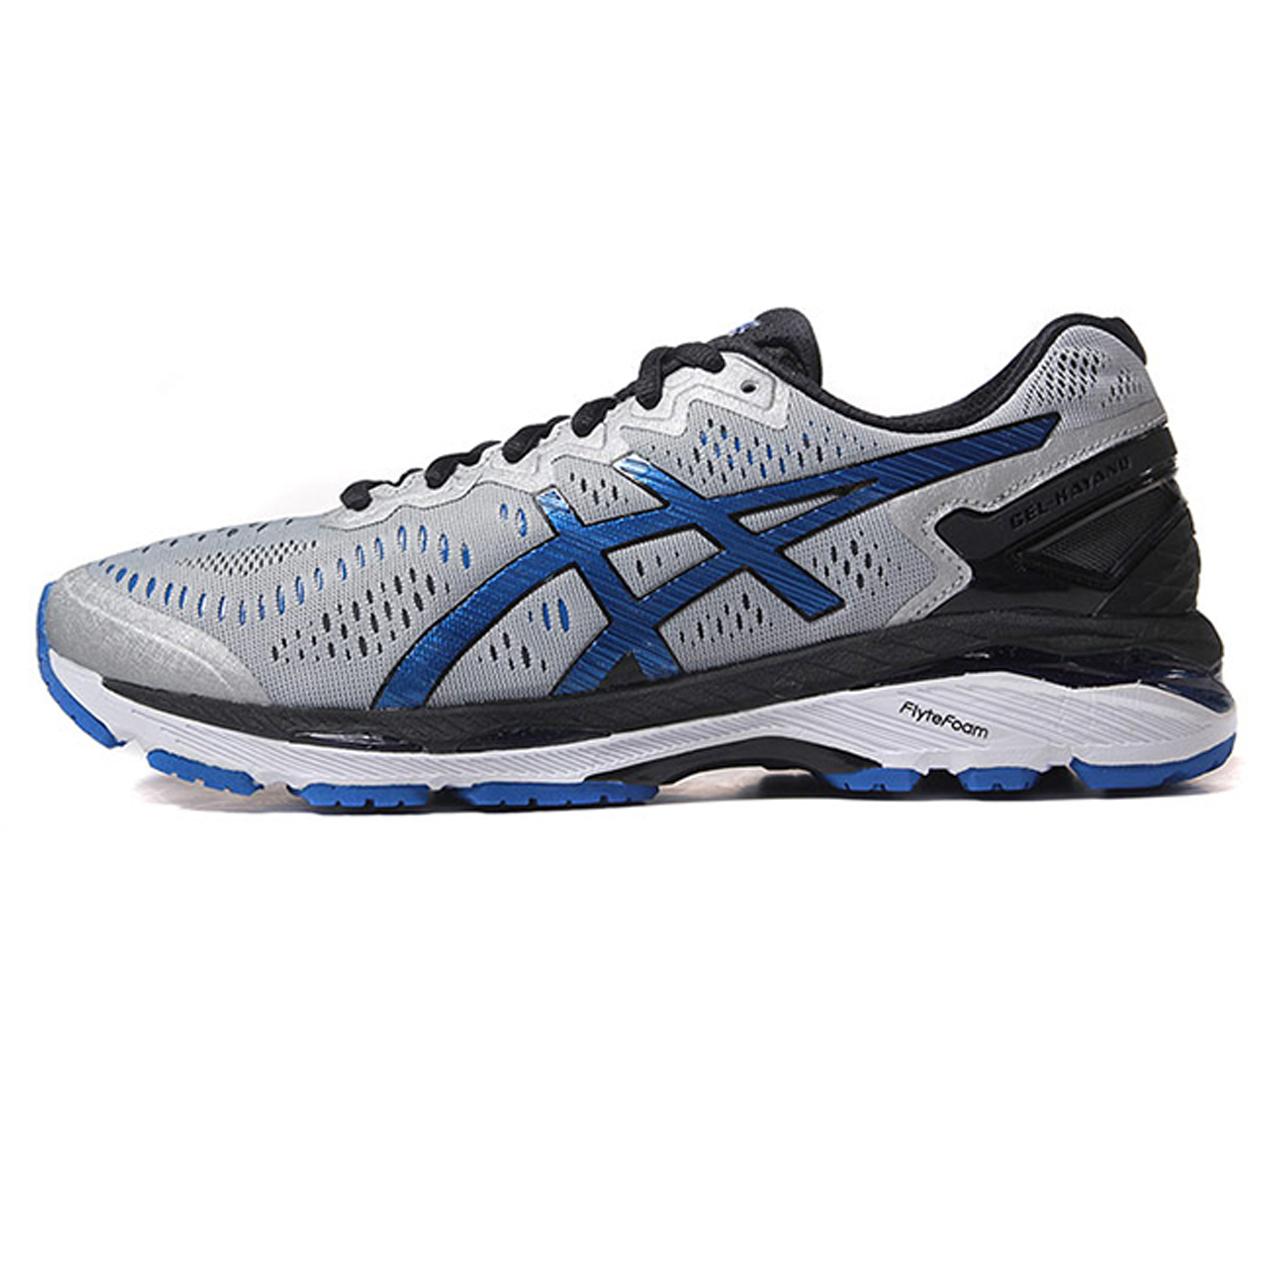 قیمت کفش مخصوص دویدن مردانه اسیکس مدل Gel Kayano    کد 23400-234